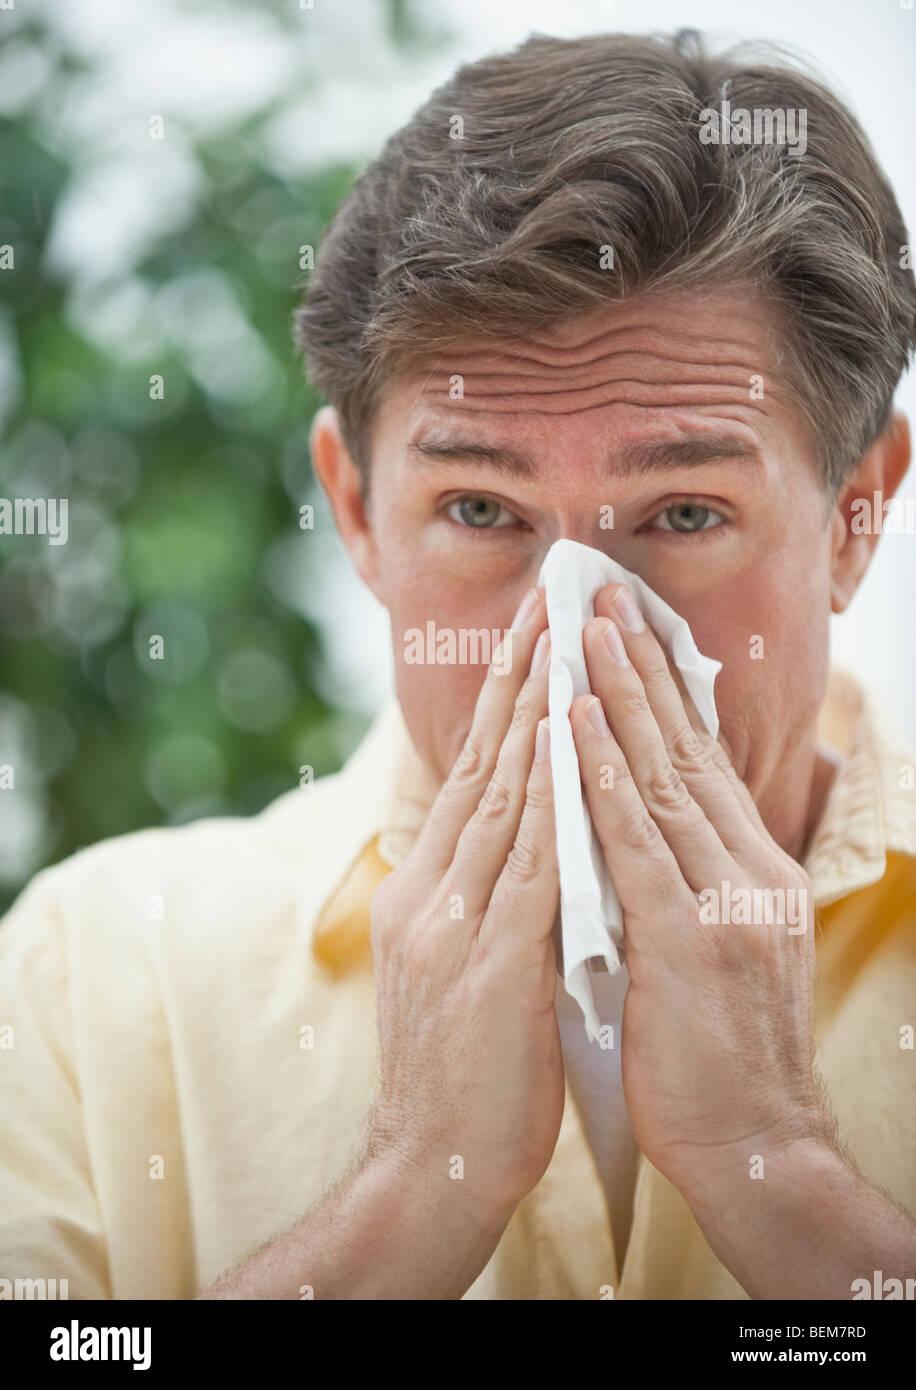 Man blowing nose - Stock Image